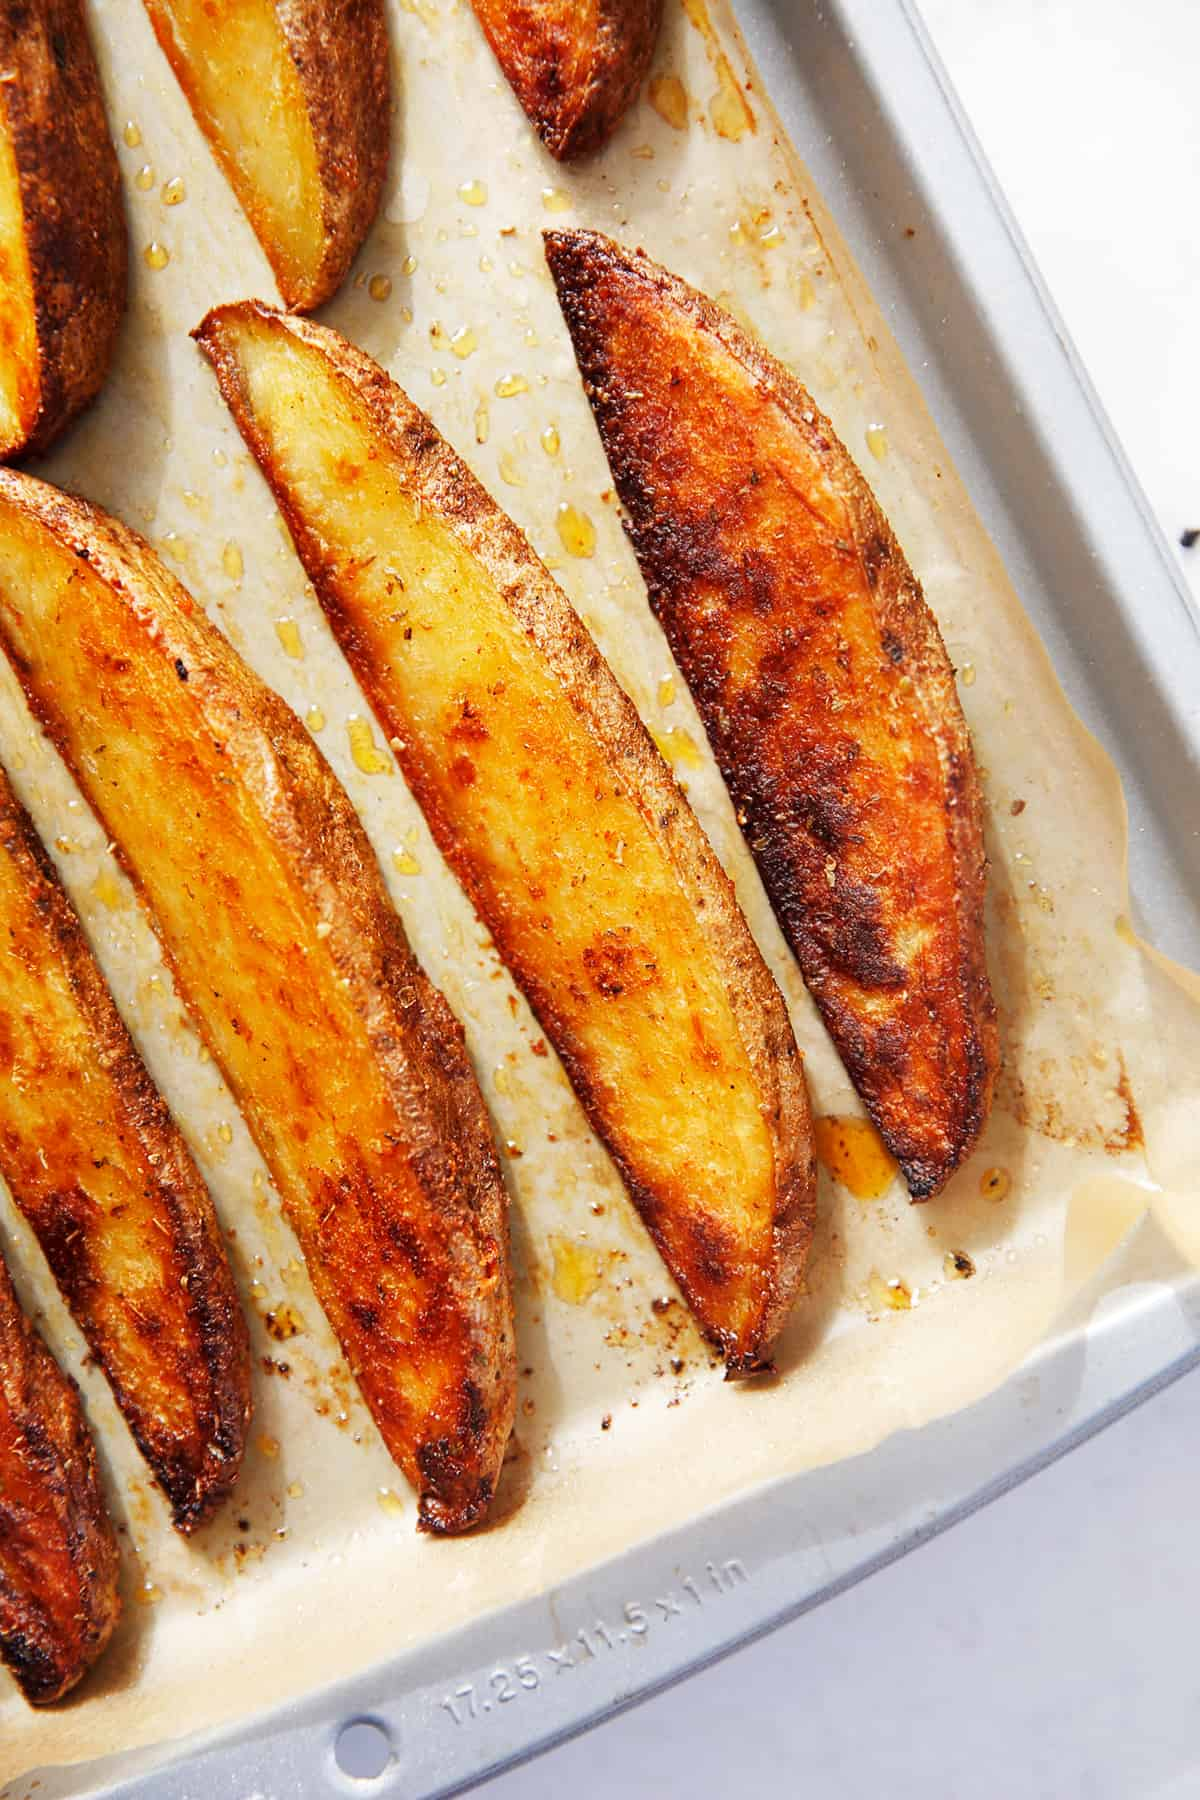 Roasted Potato Wedges on a Sheet Pan